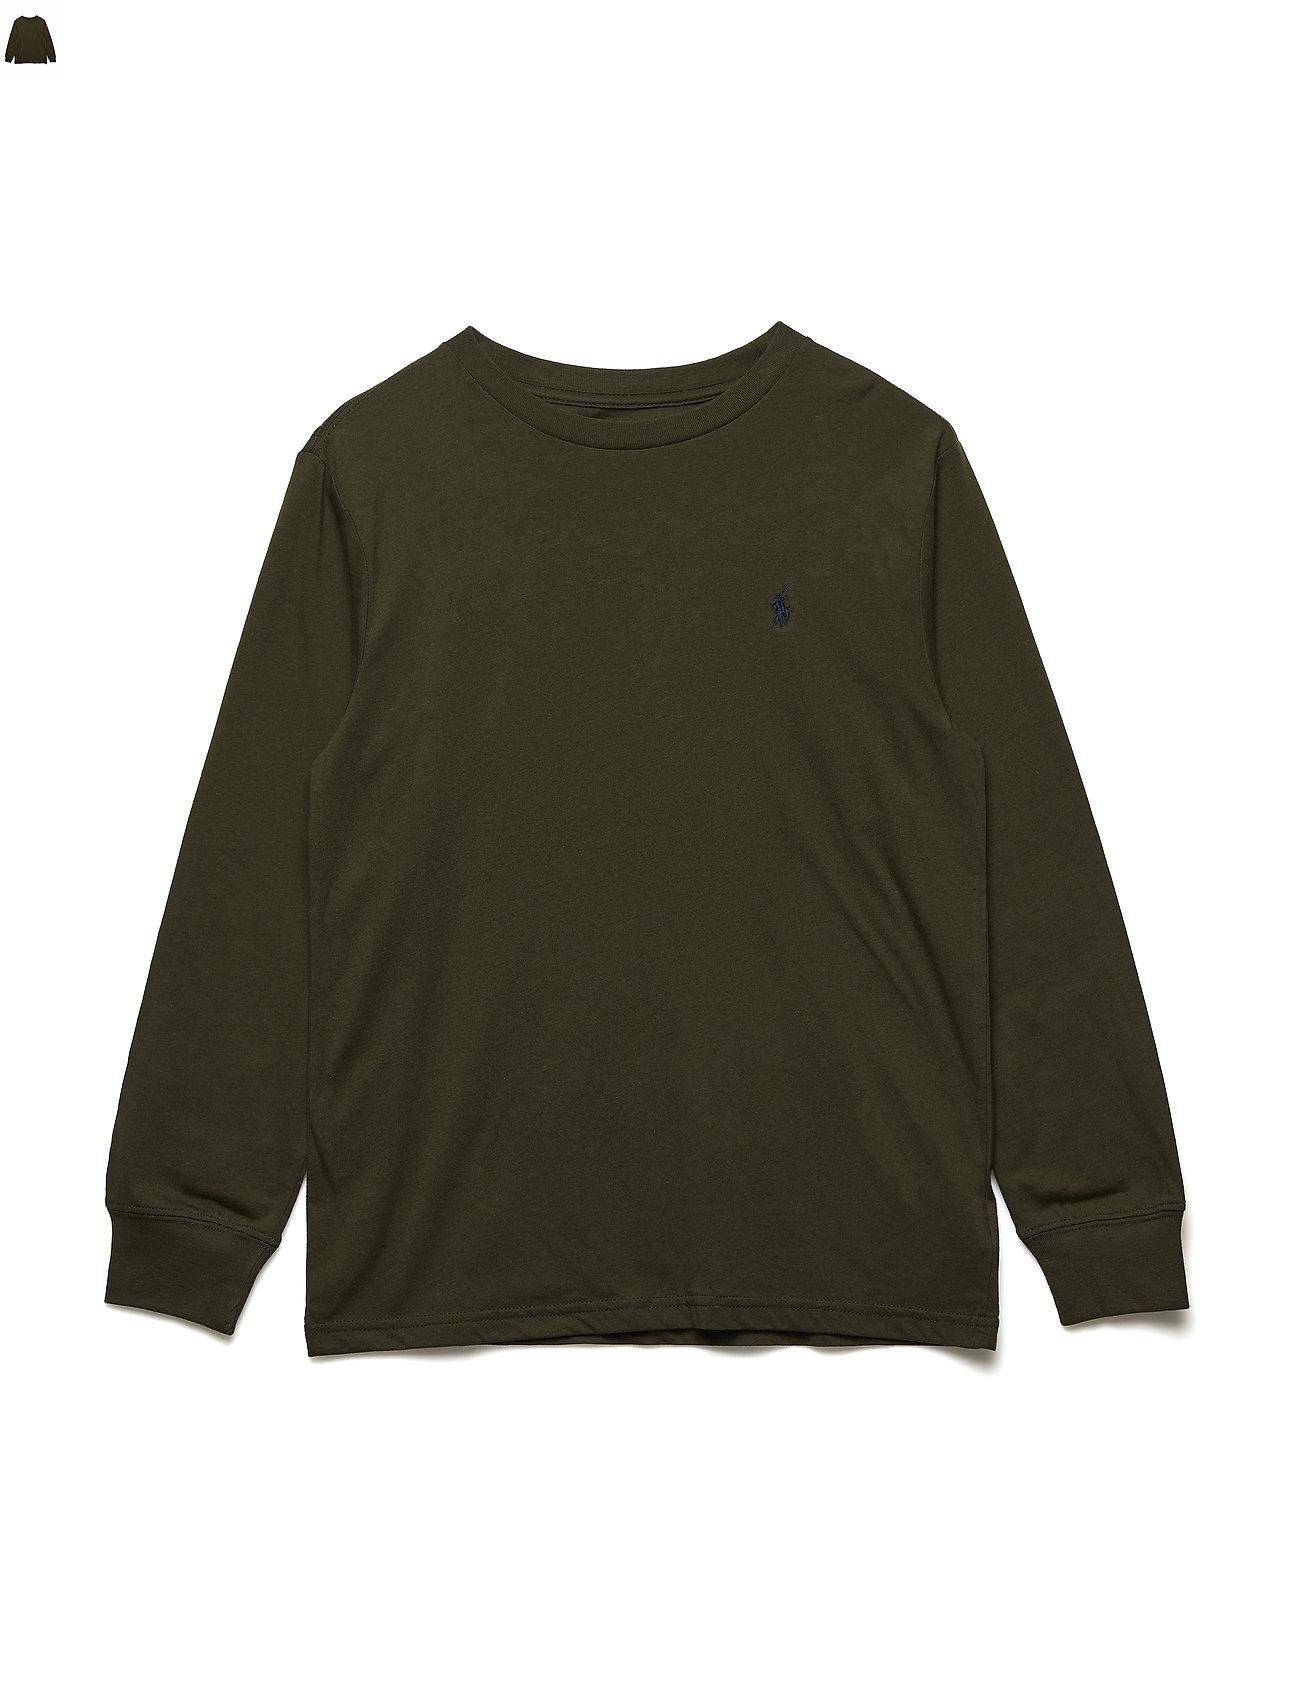 25099e6f Cotton Long-sleeve T-shirt (Armadillo) (24.05 €) - Ralph Lauren Kids ...